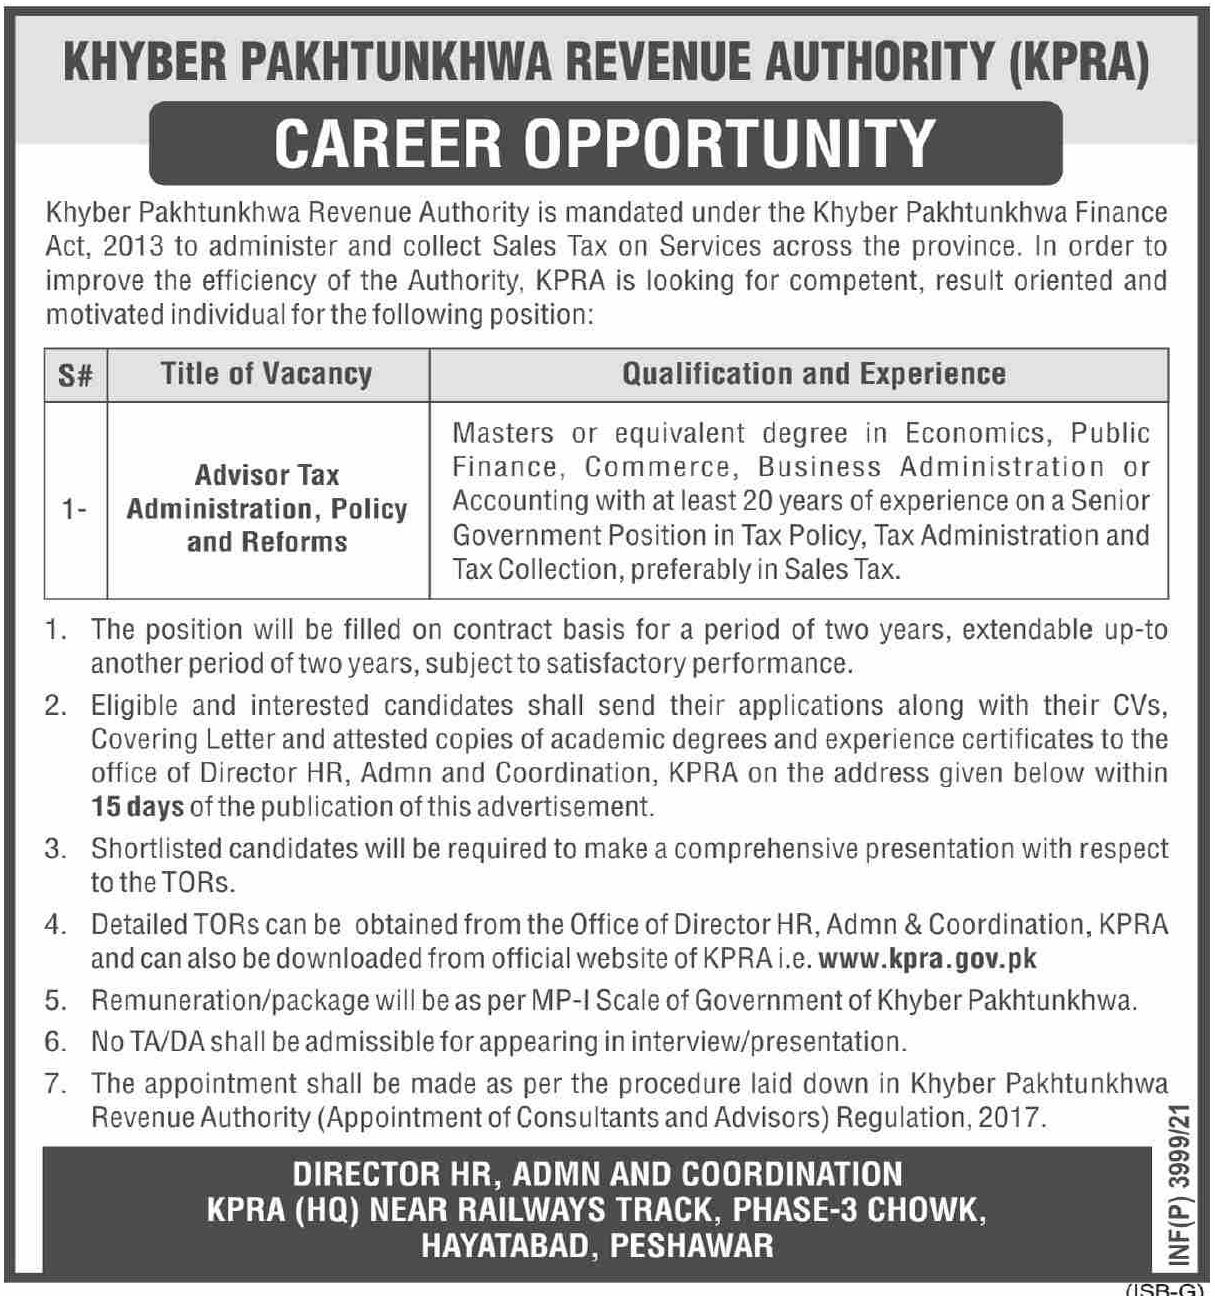 Khyber Pakhtunkhwa Revenue Authority KPRA Vacancies 2021 1